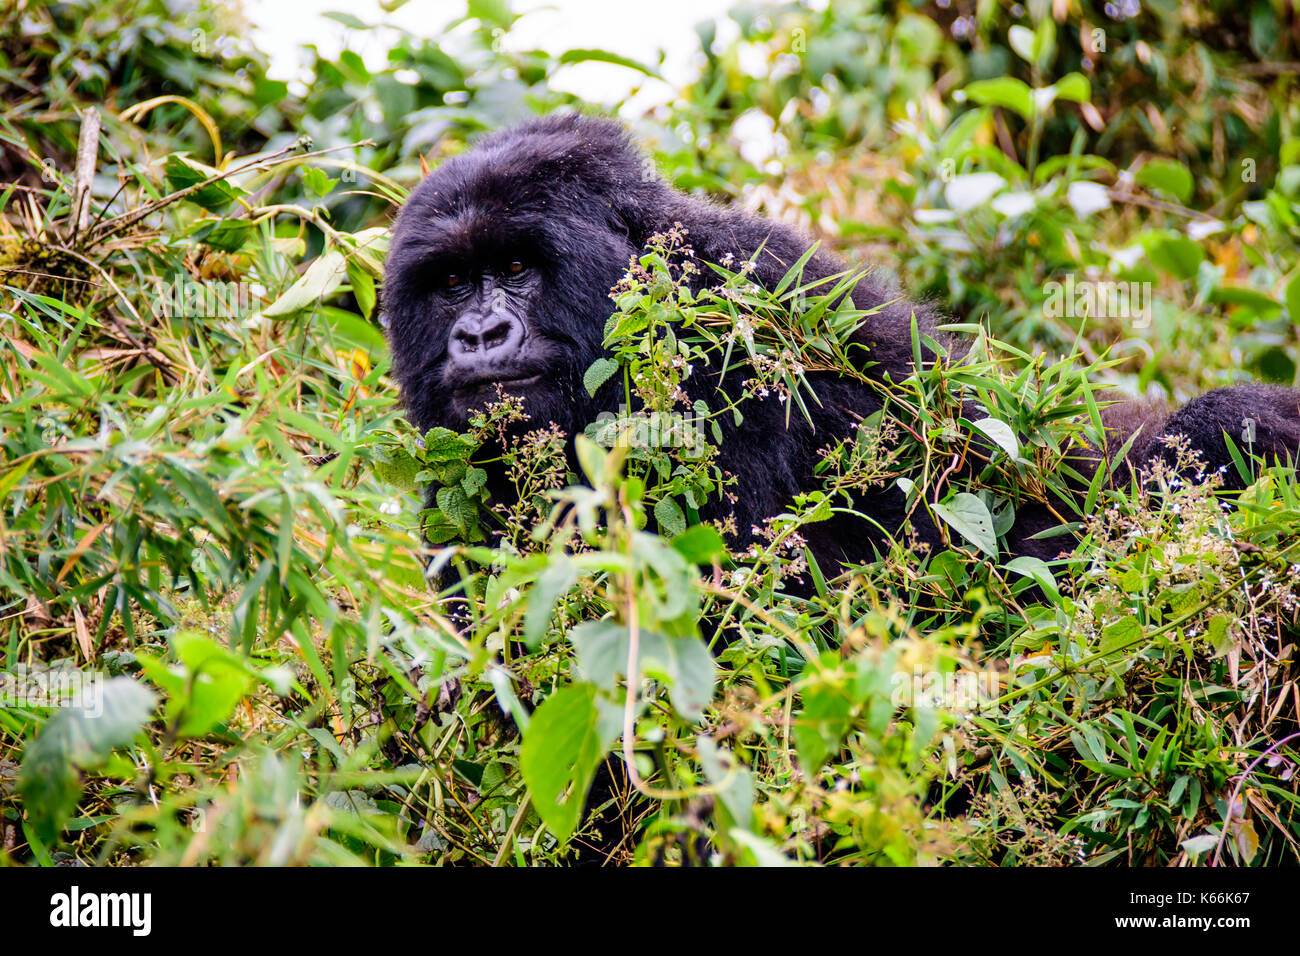 female mountain gorilla peering through the undergrowth - Stock Image